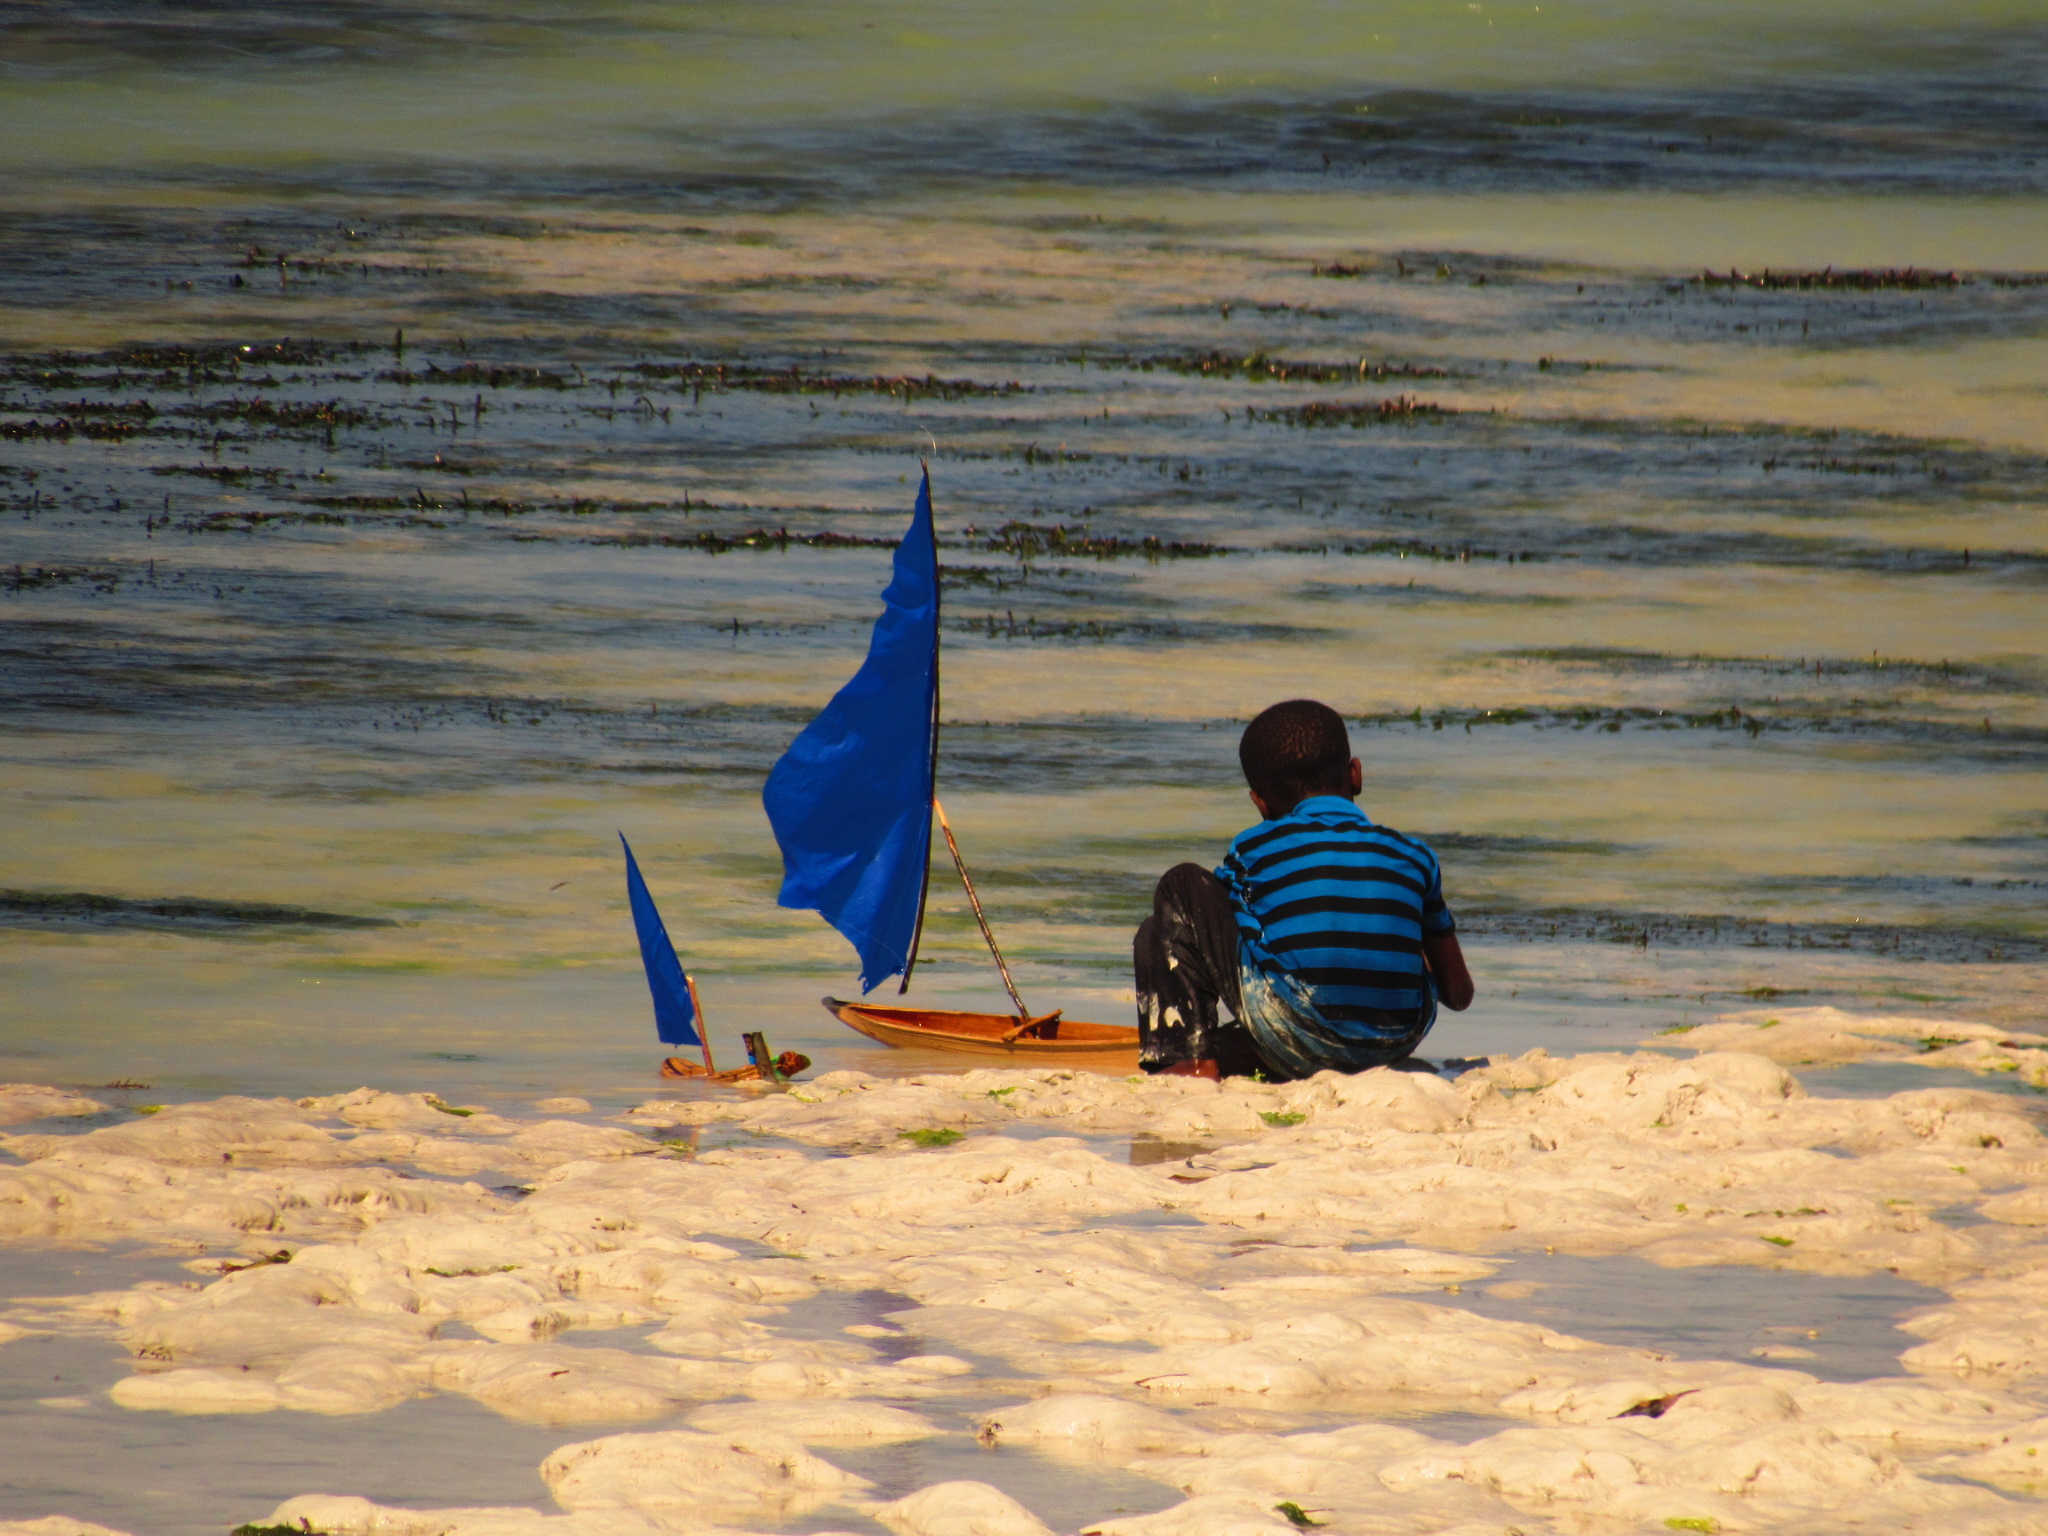 Kid playing with a blue boat on Jambiani Beach in Zanzibar, Tanzania